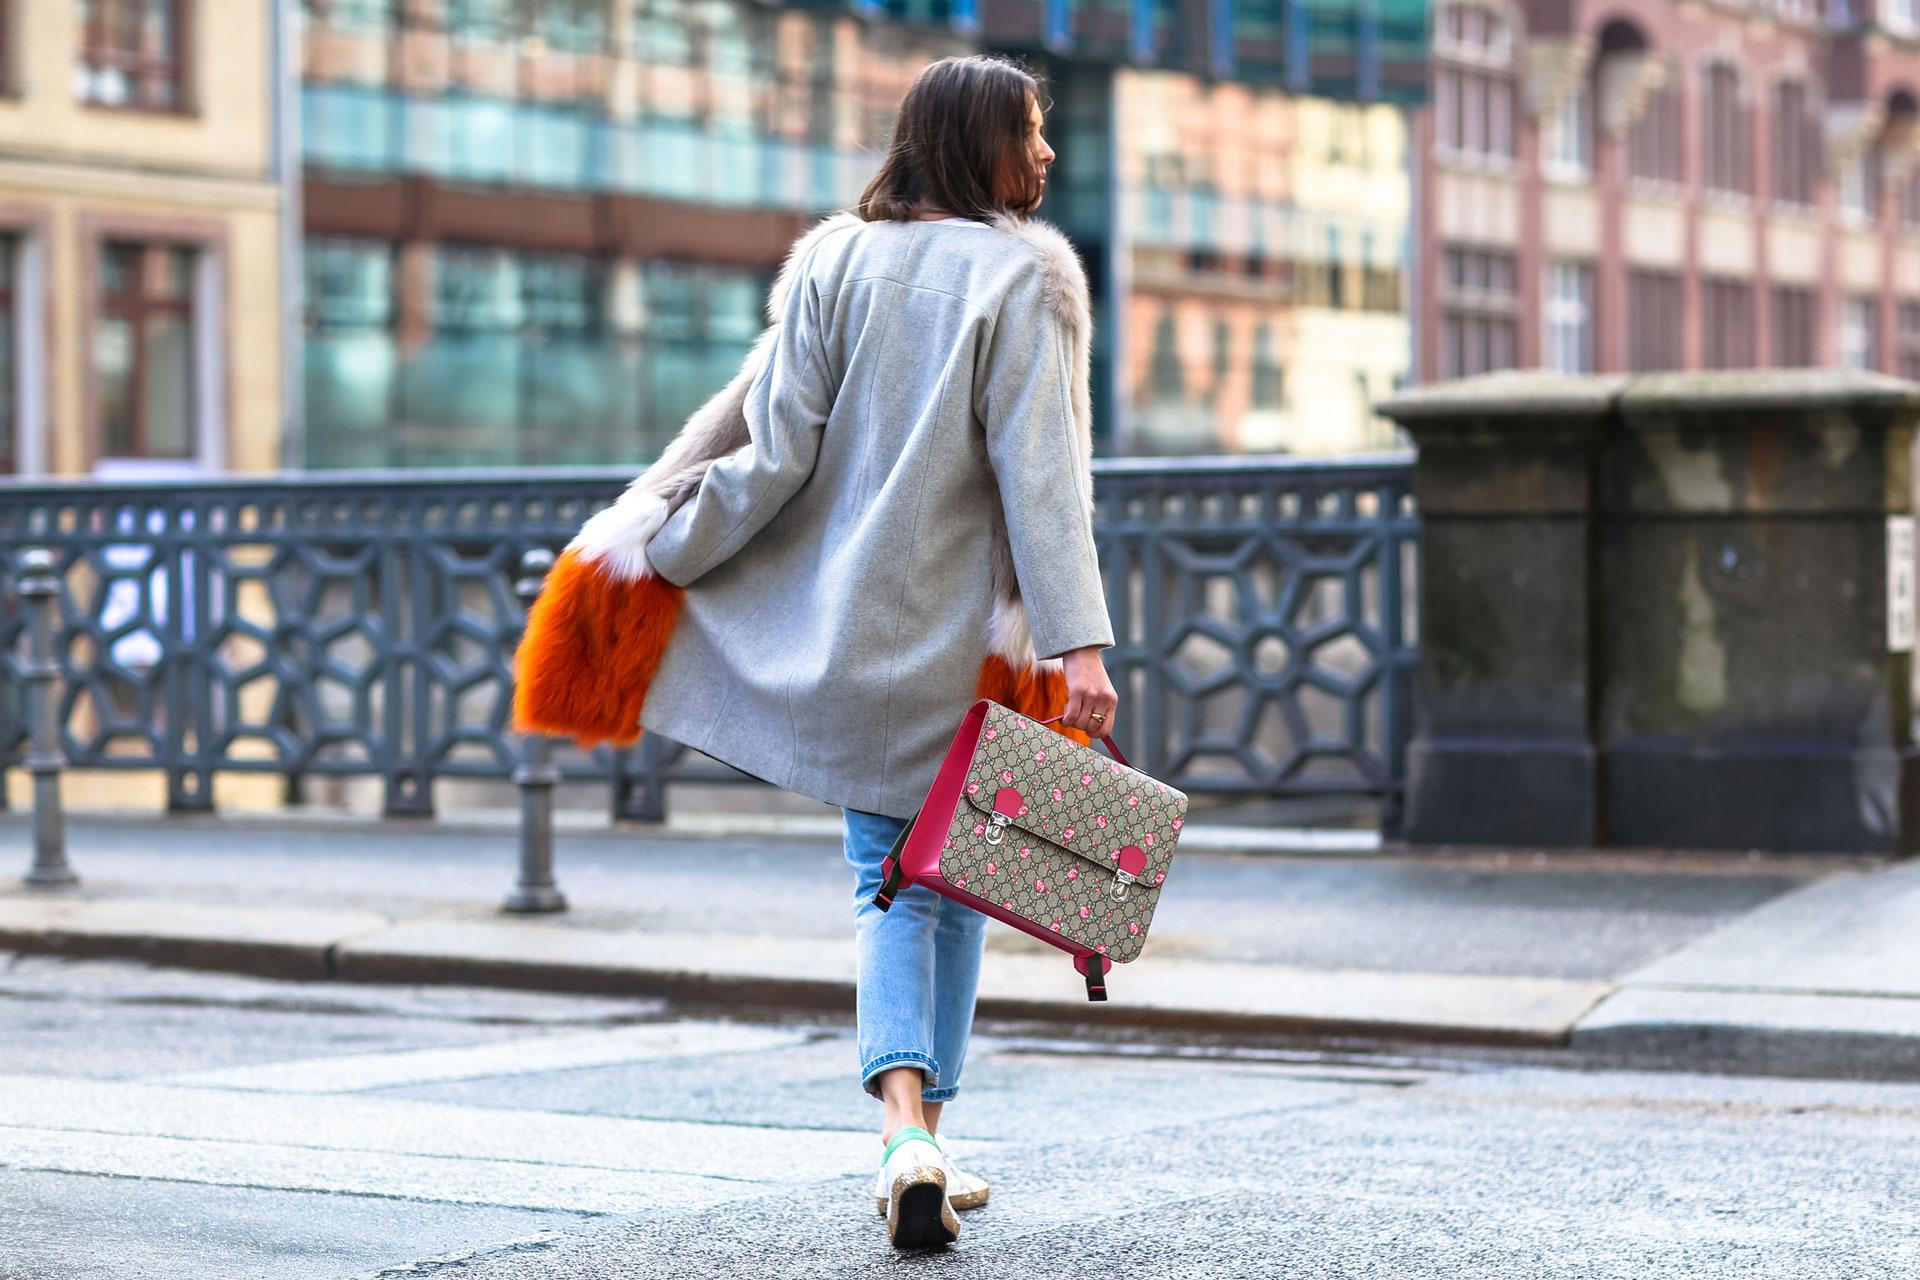 luxussachenblog